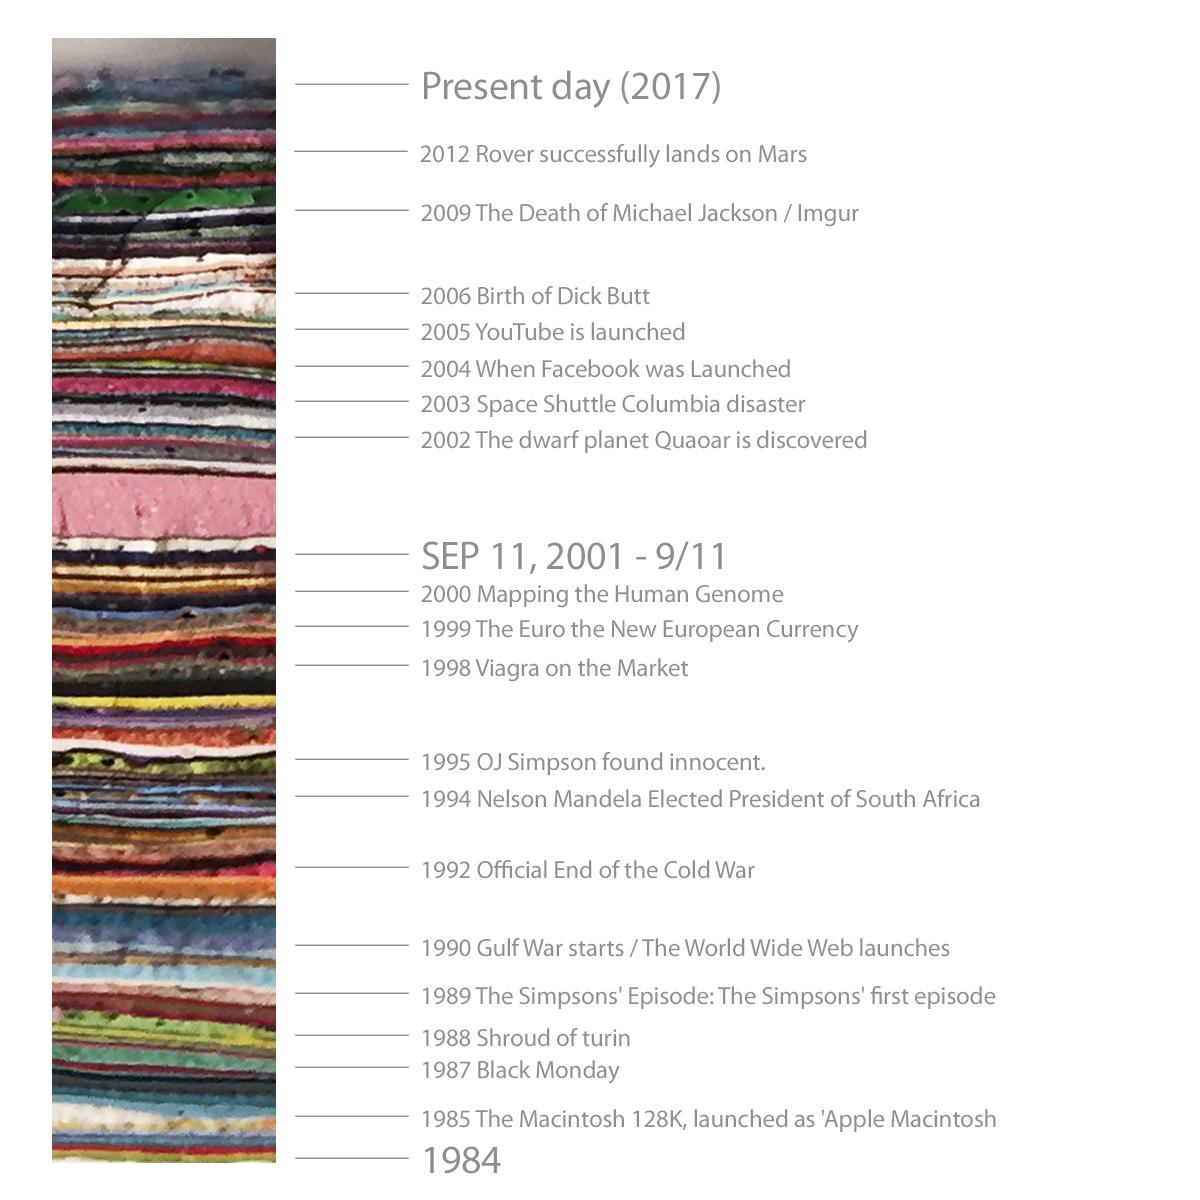 Camadas ao longo do tempo